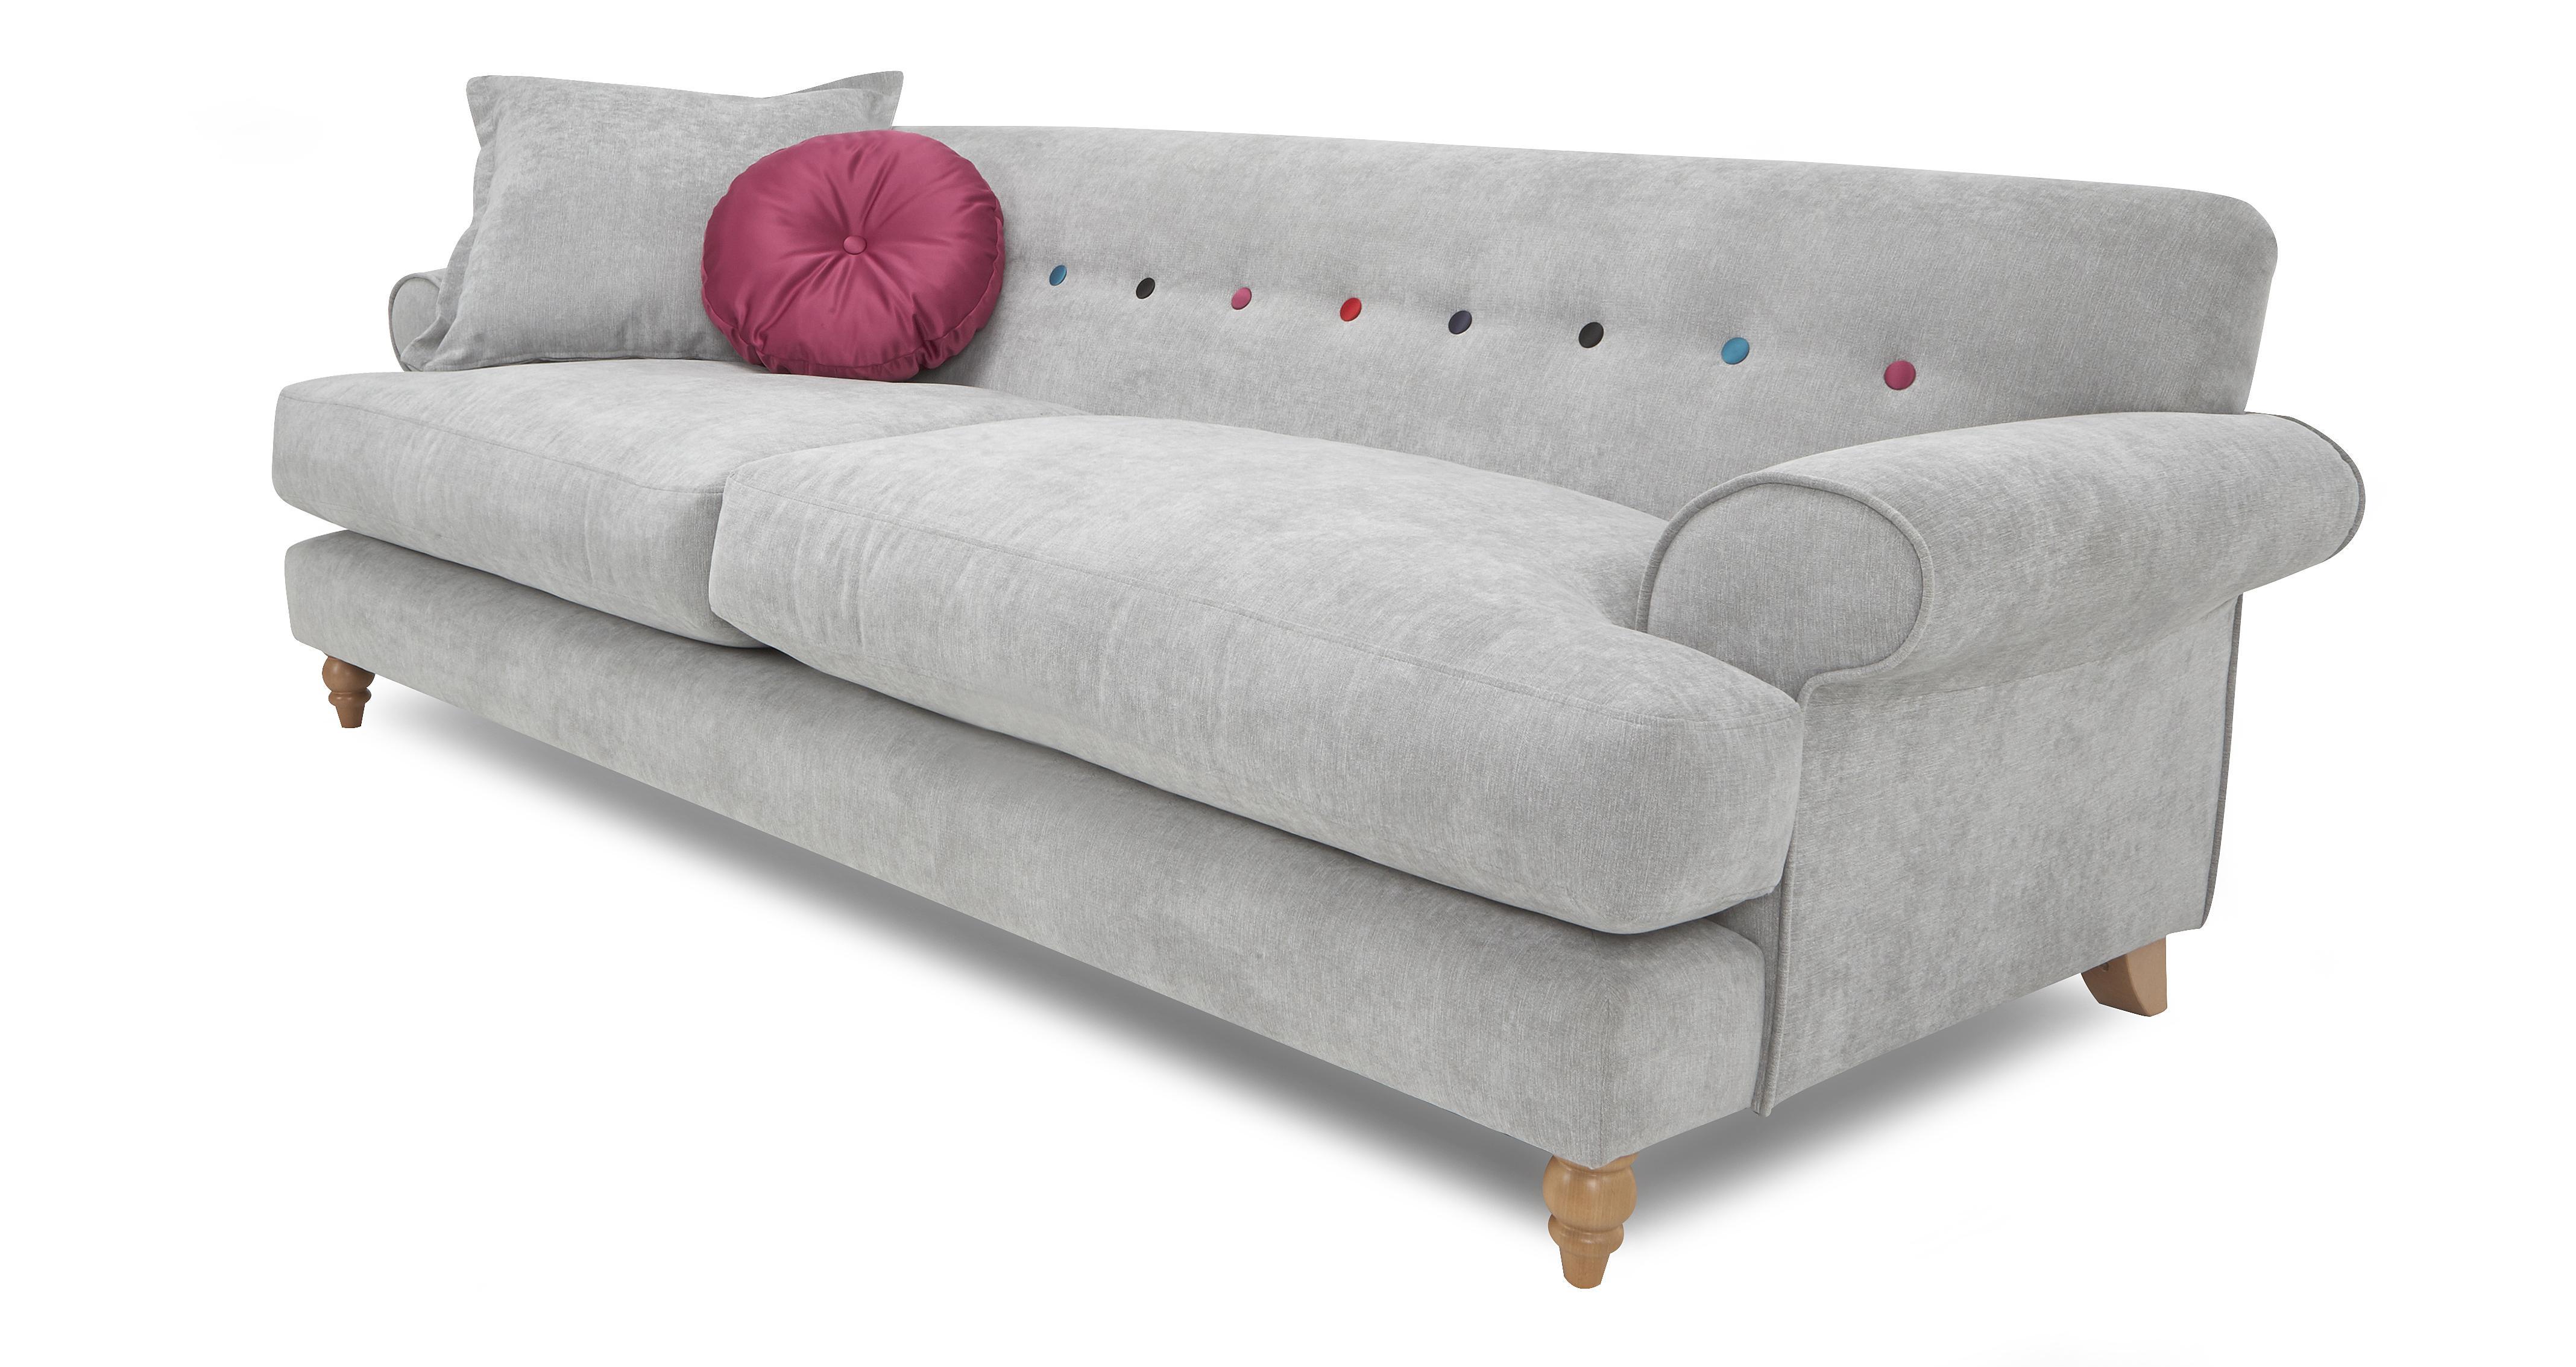 lodge sofa dfs jordan dress womens clothing four seater sofas